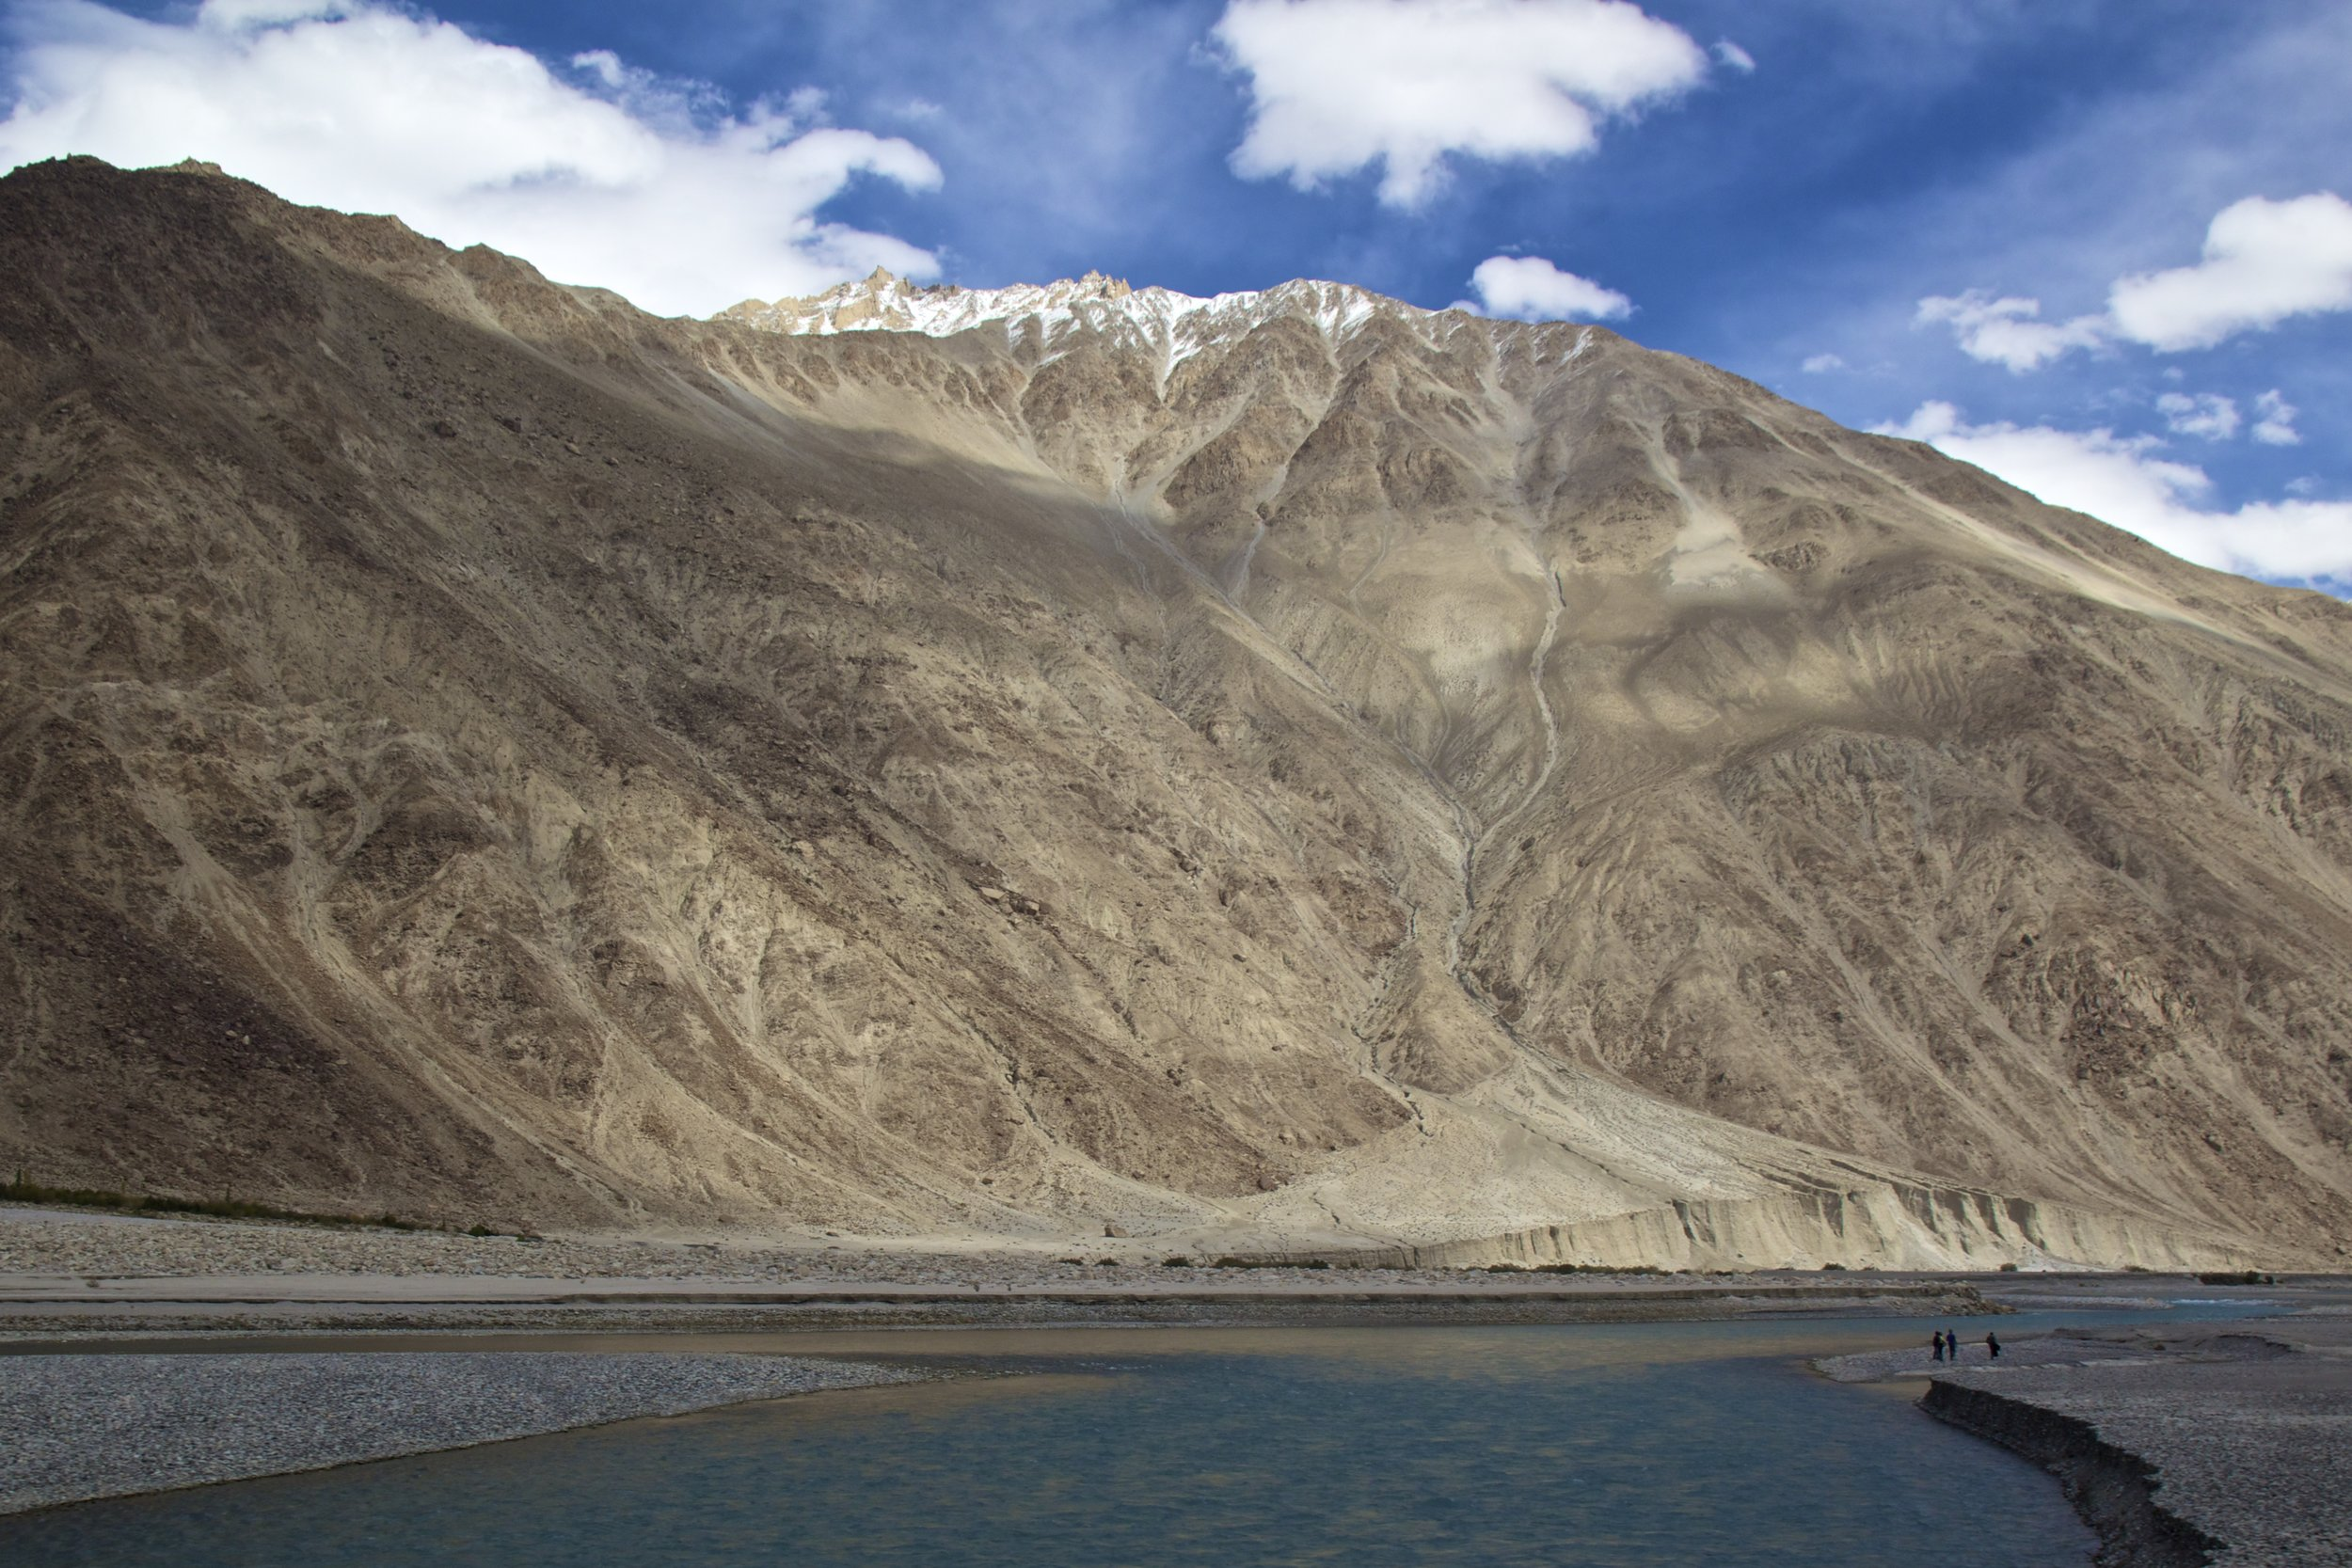 Shyok River Ladakh Gilgit Baltistan Indian Himalayas 6.jpg